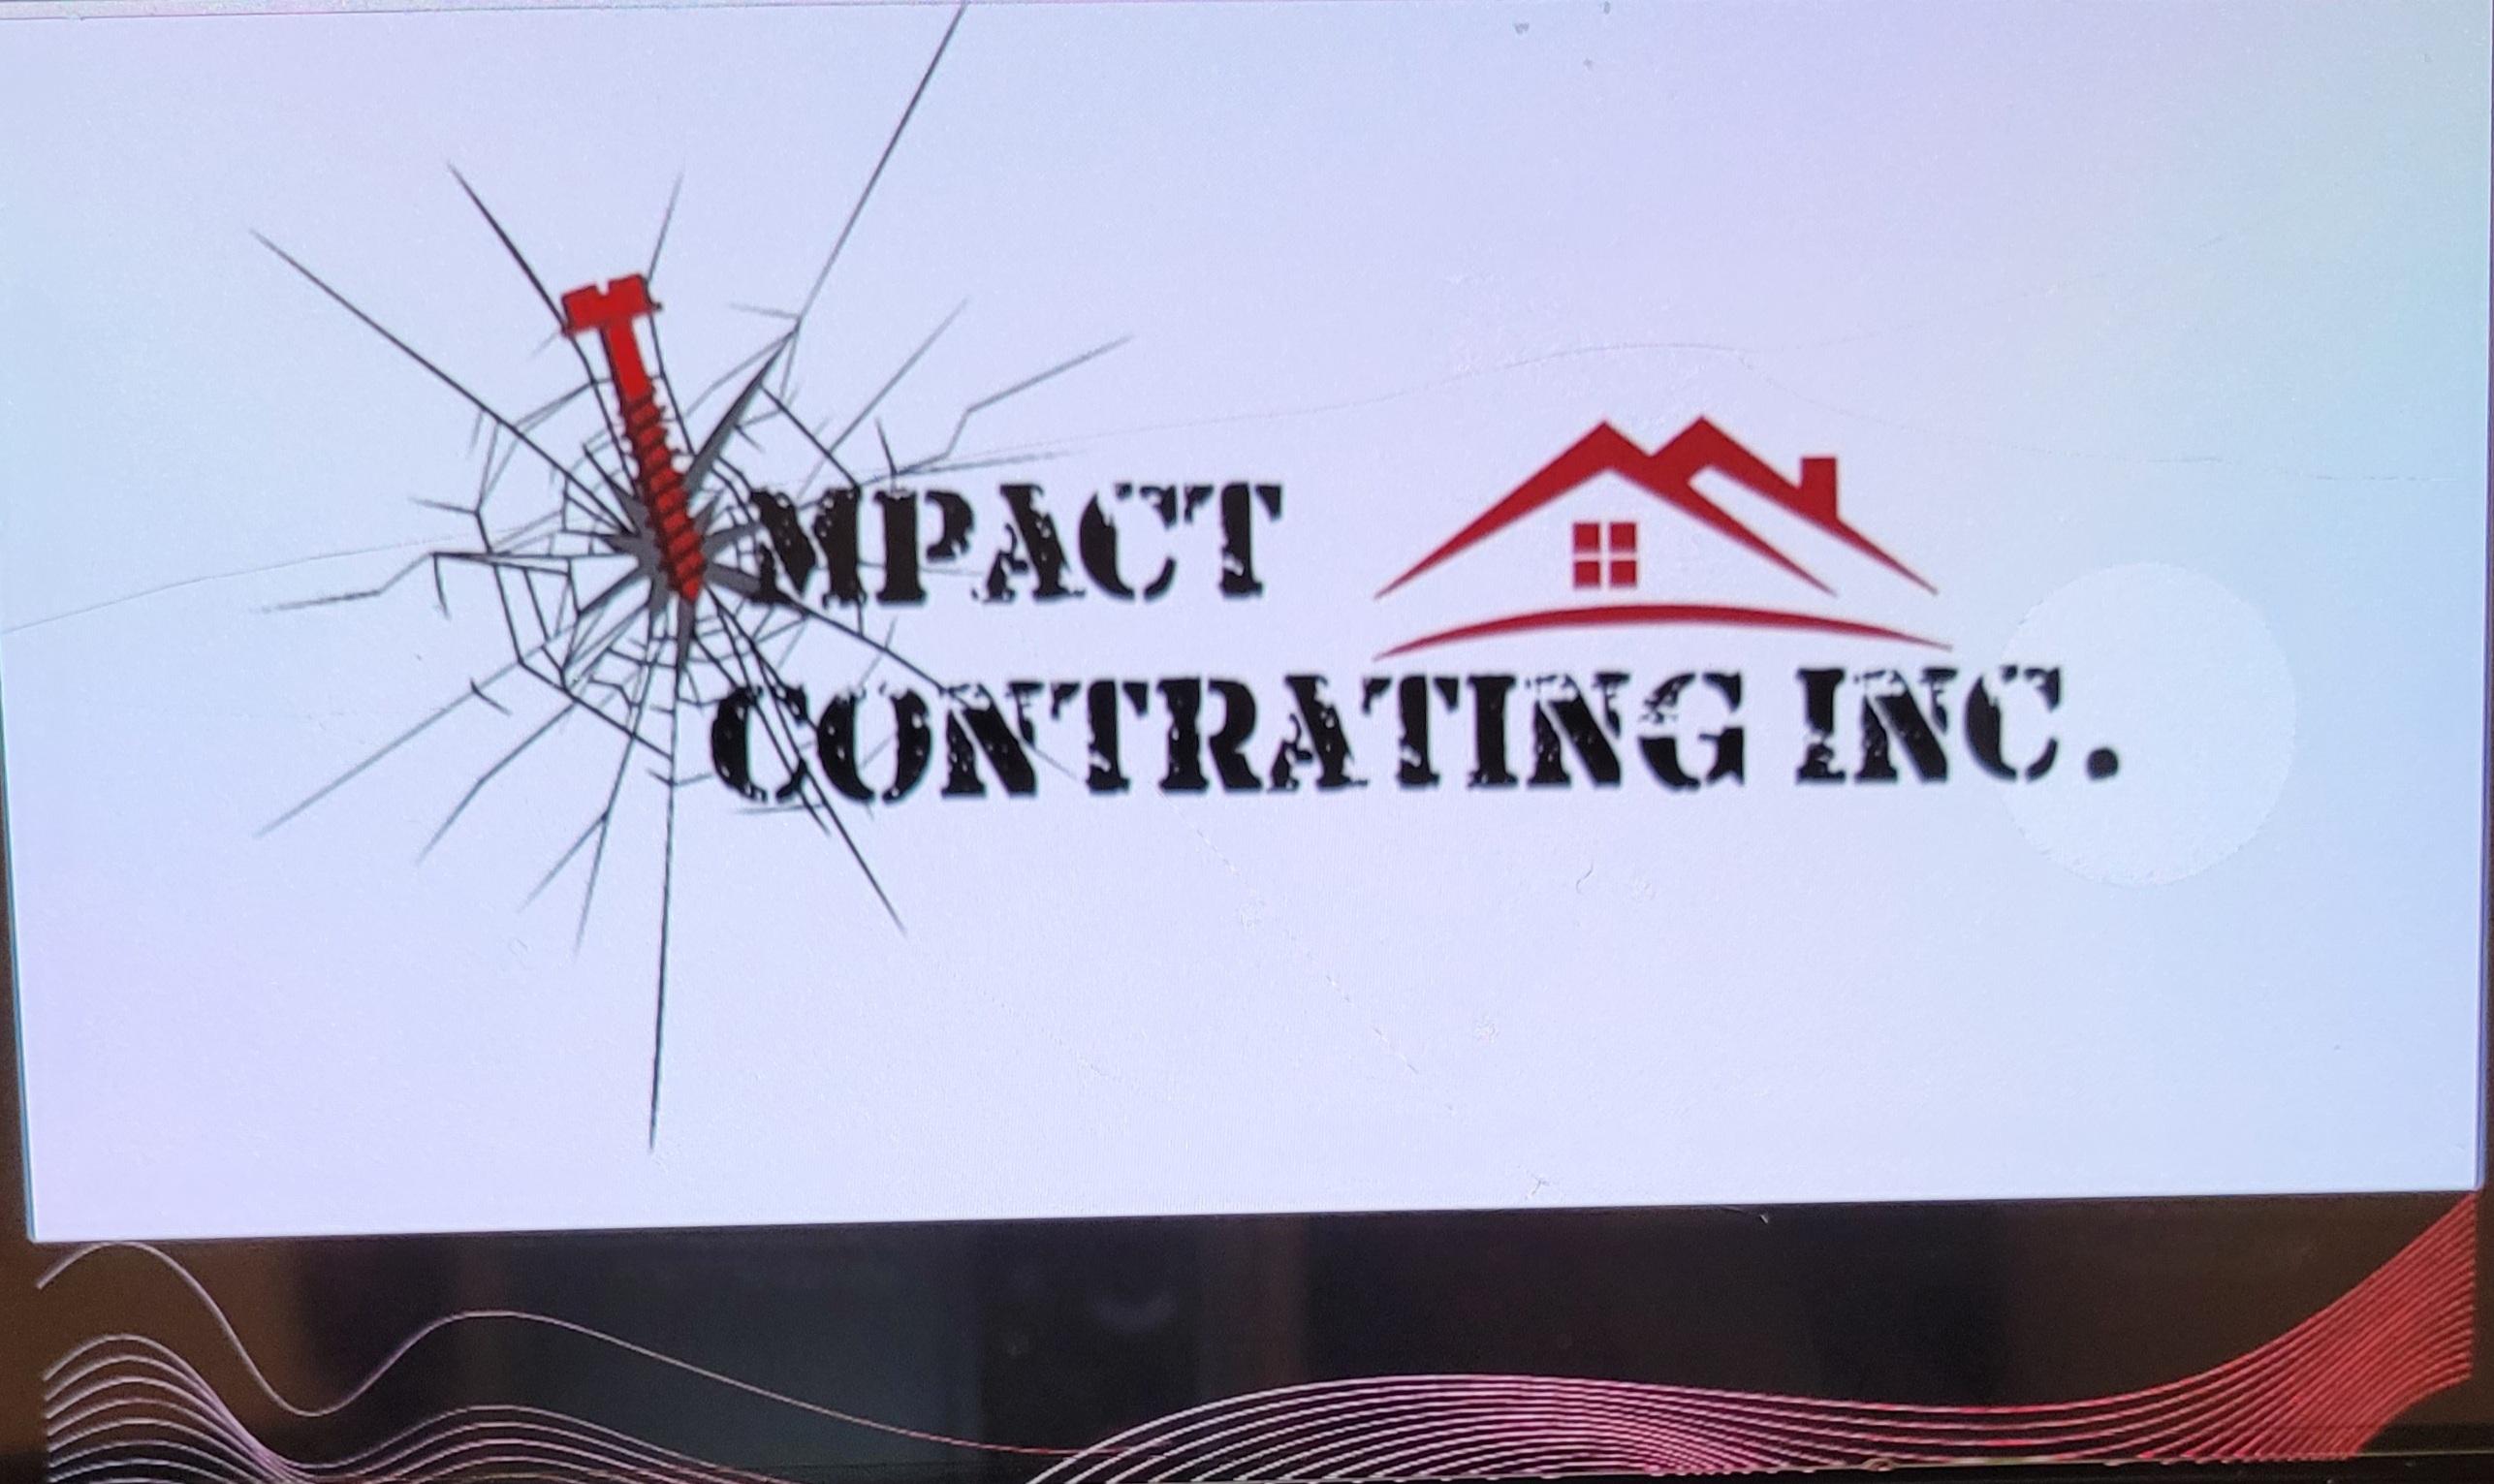 Impact contracting.inc